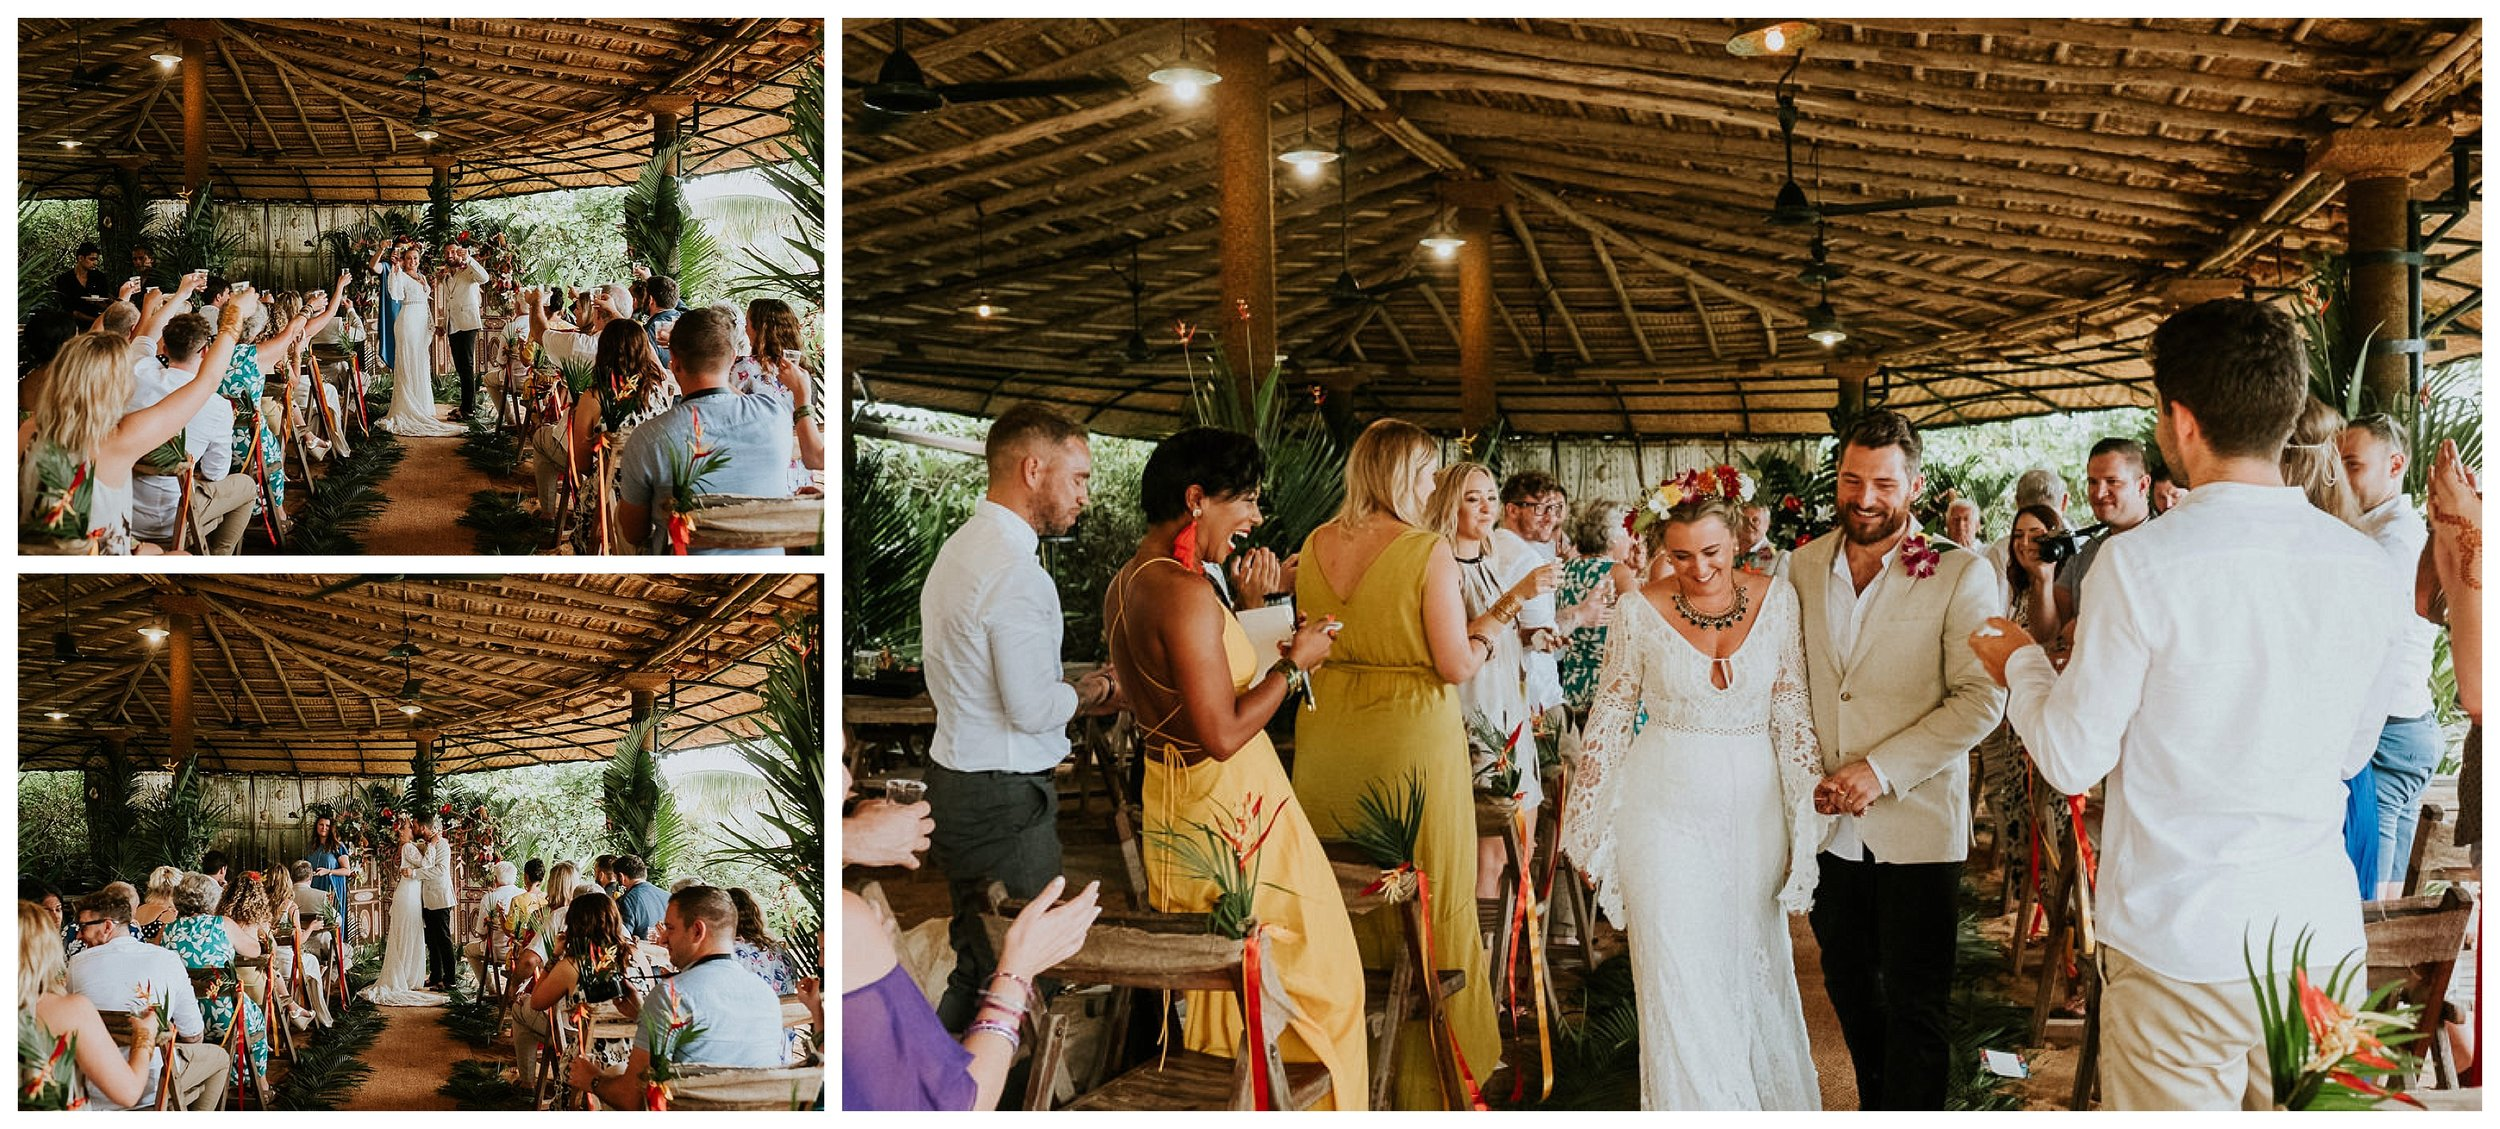 Goa Destination Wedding Photographer India Colouful Fun Joanna Nicole Photography Coco Shambhala12.jpg